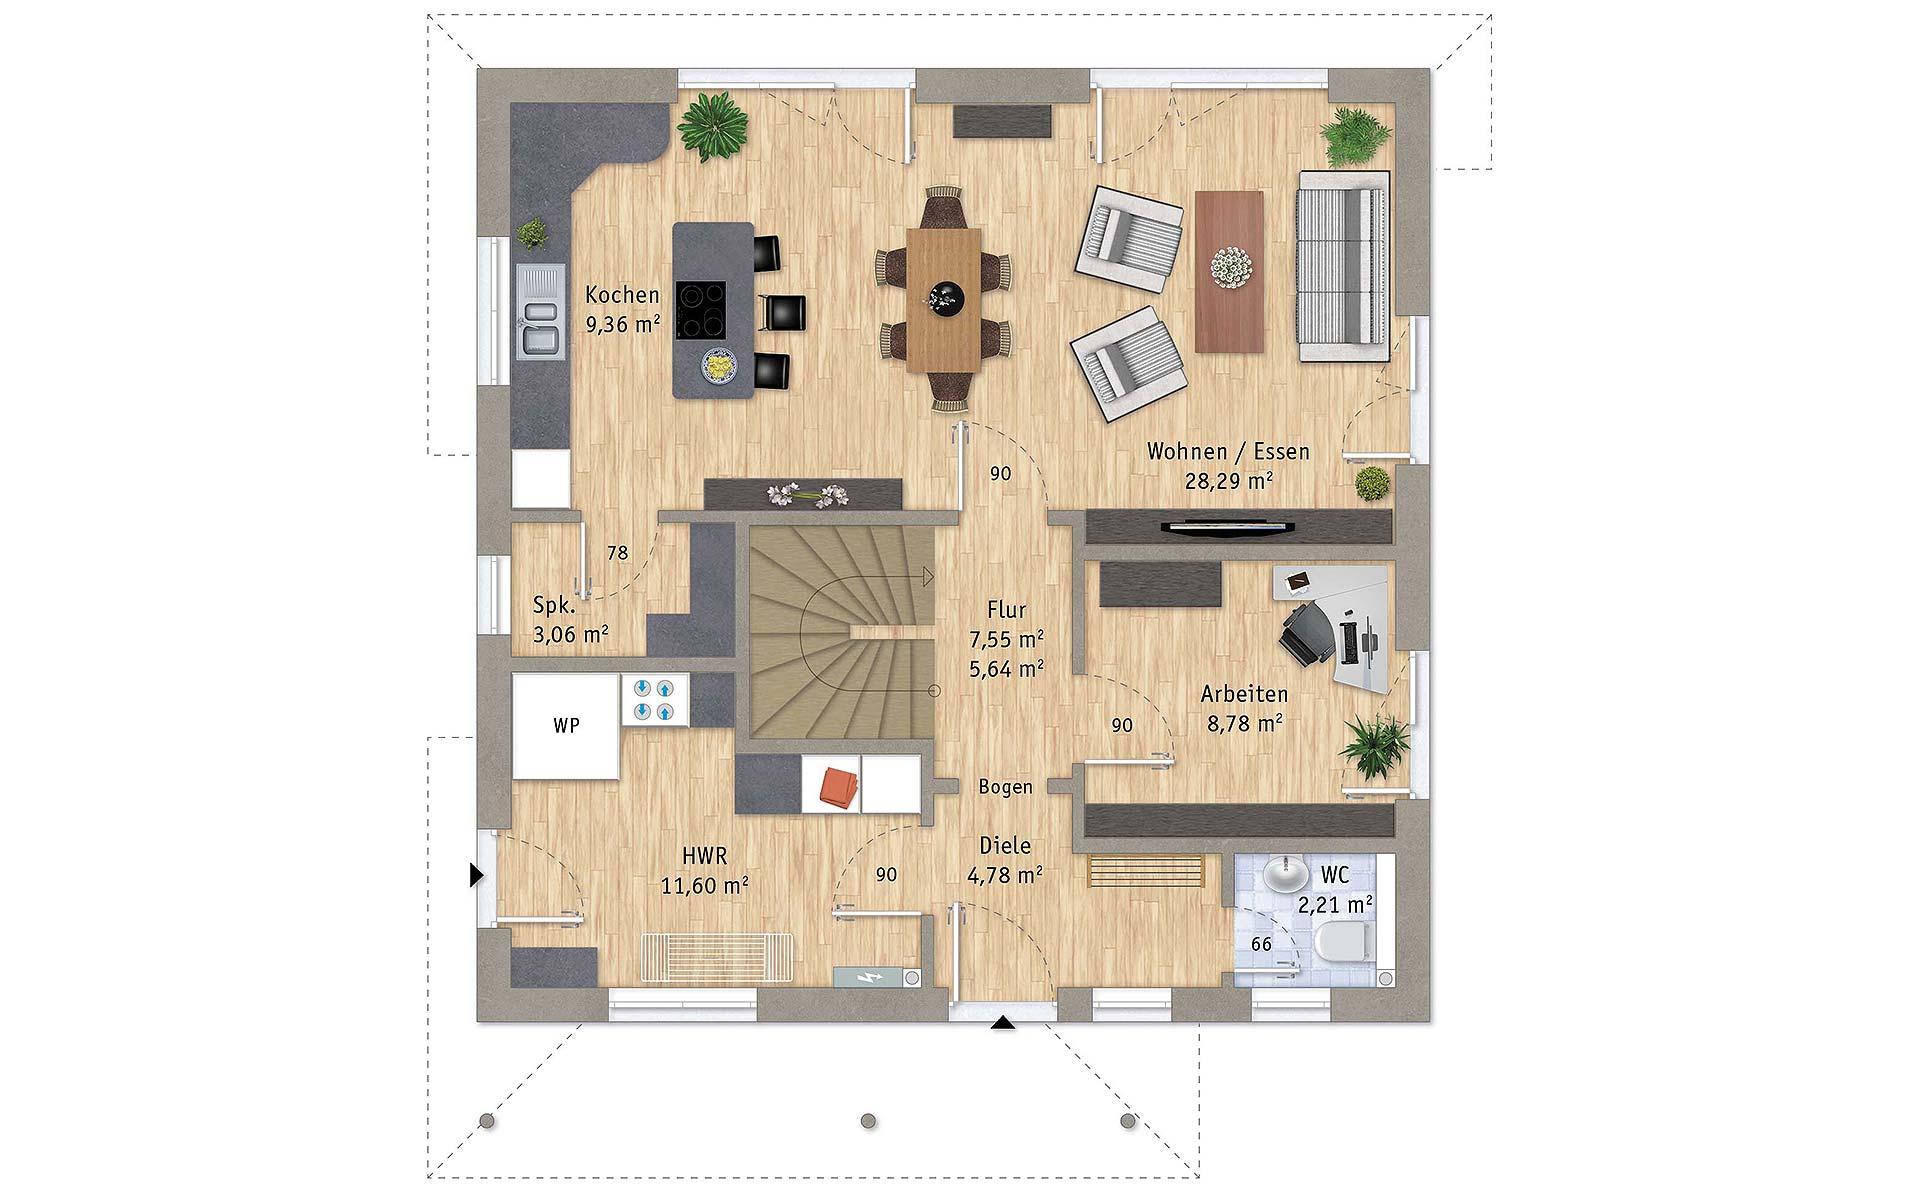 Erdgeschoss VarioToscana 133 von VarioSelf Lizenzgesellschaft mbH